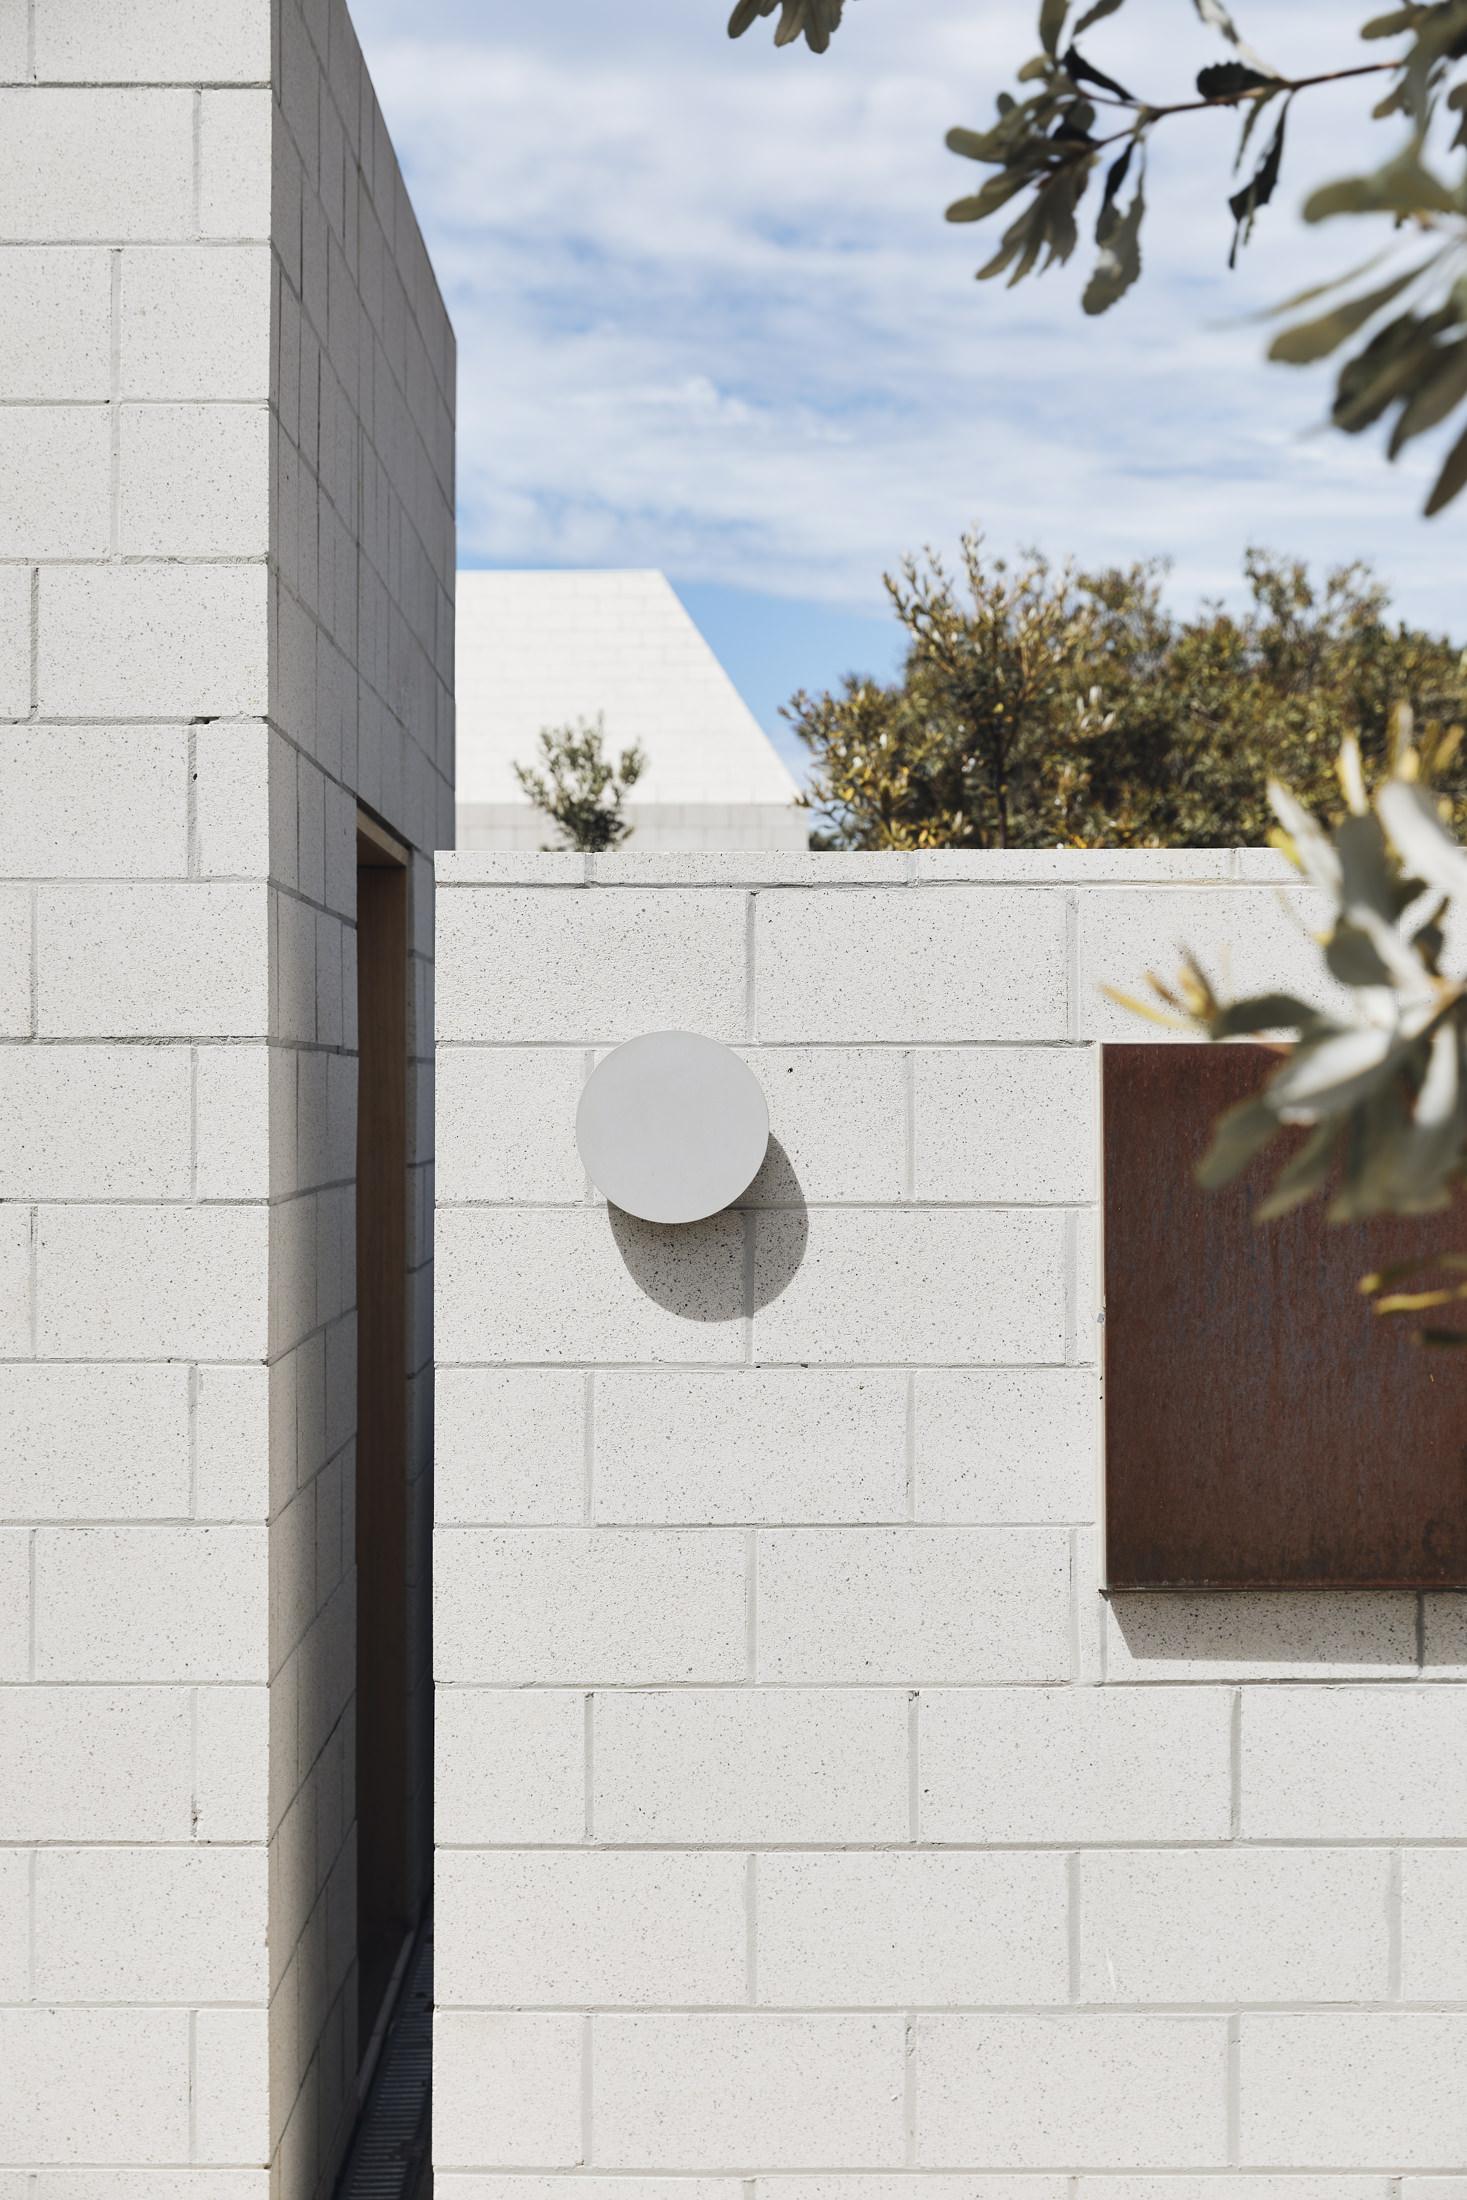 Architects Eat Bellows Beach House Flinders Masonry Architecture Photo Derek Swalwell Yellowtrace 56